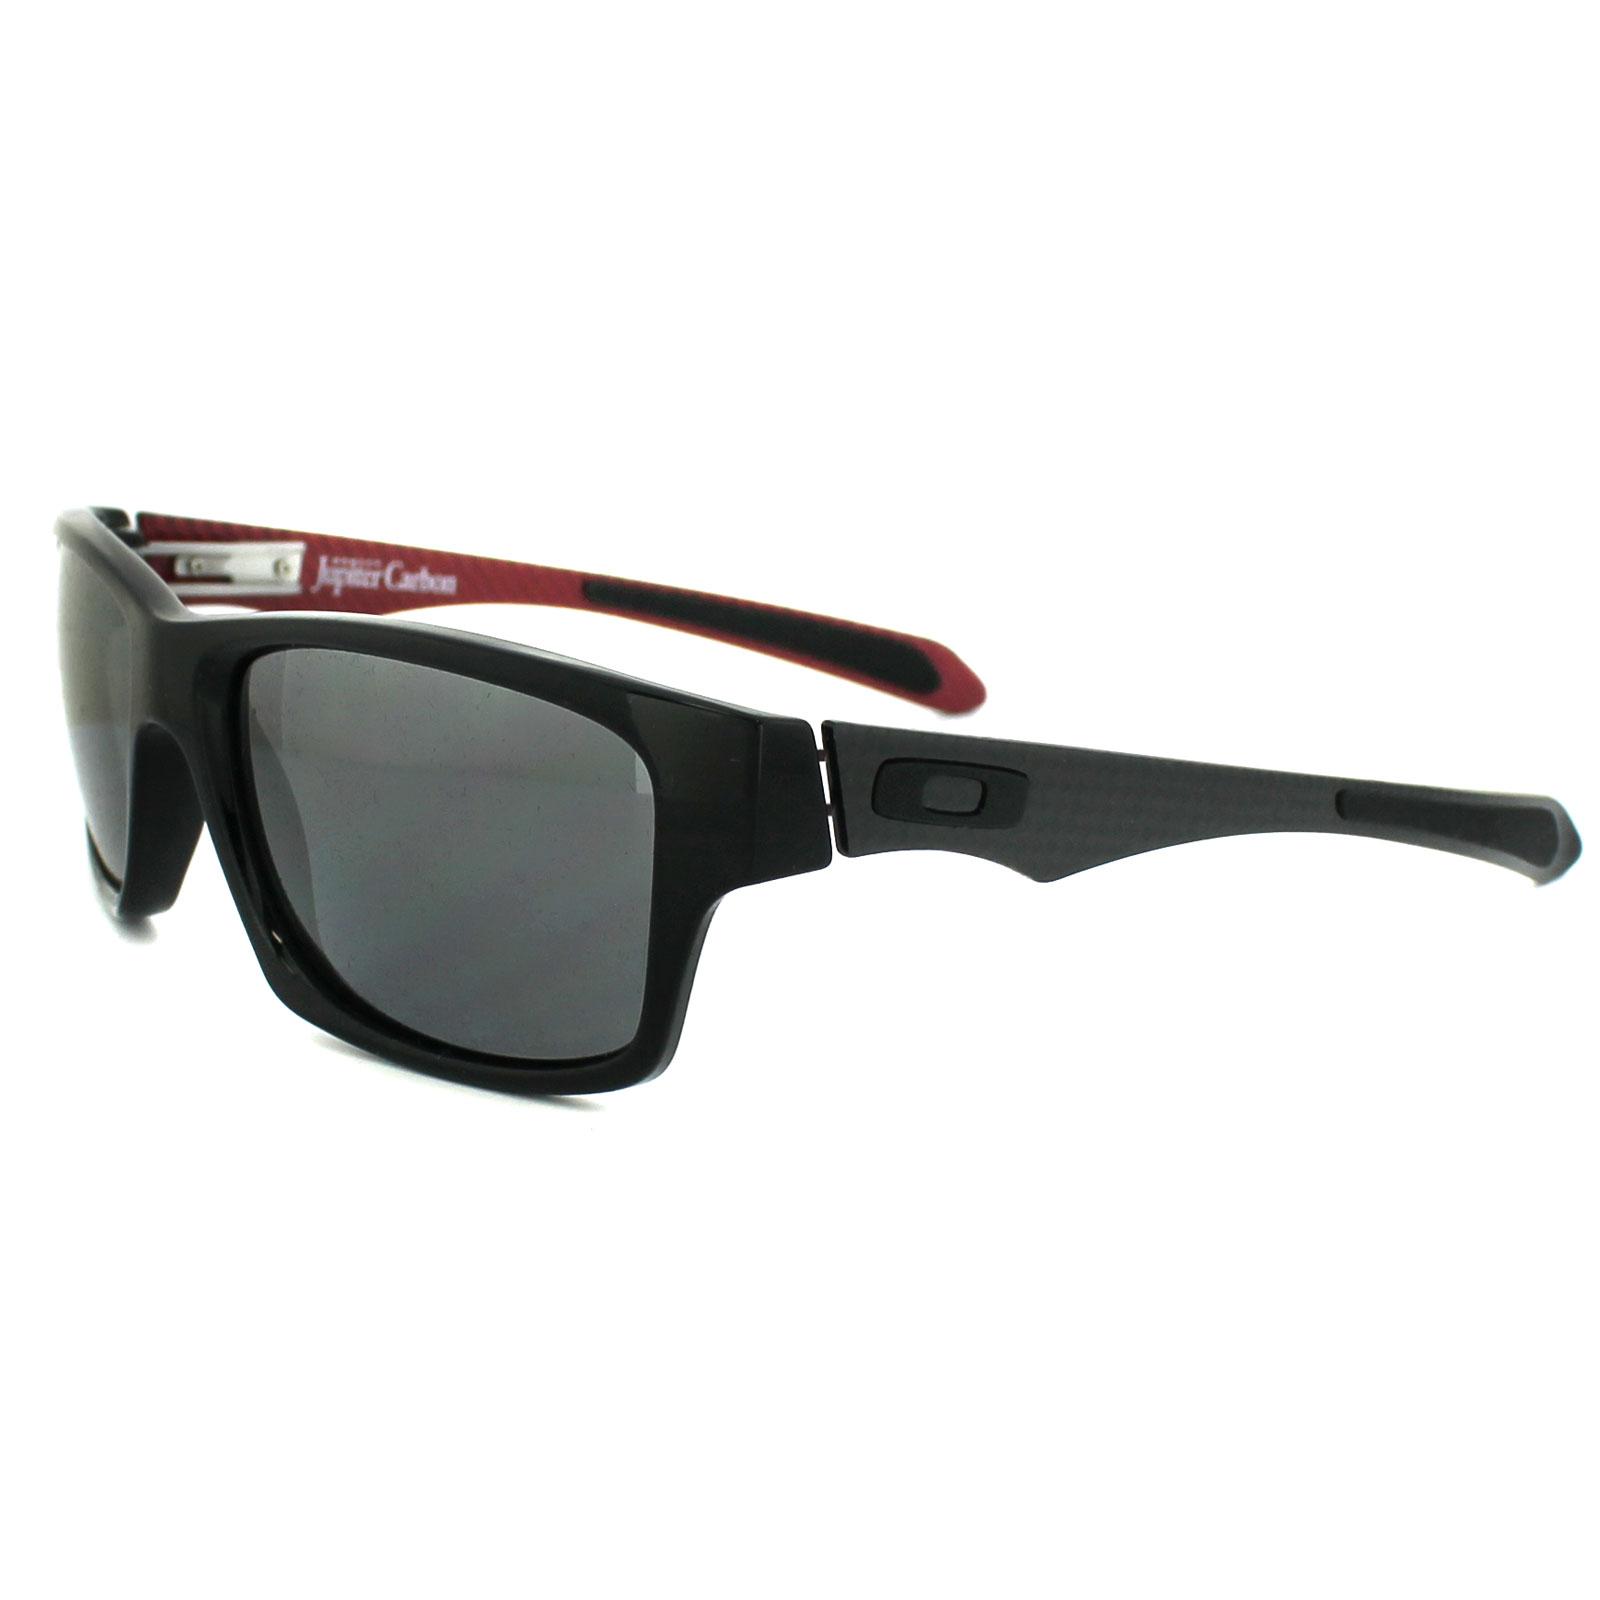 911eb44f41 Sentinel Oakley Sunglasses Jupiter Carbon 9220-01 Polished Black Black  Iridium Polarized